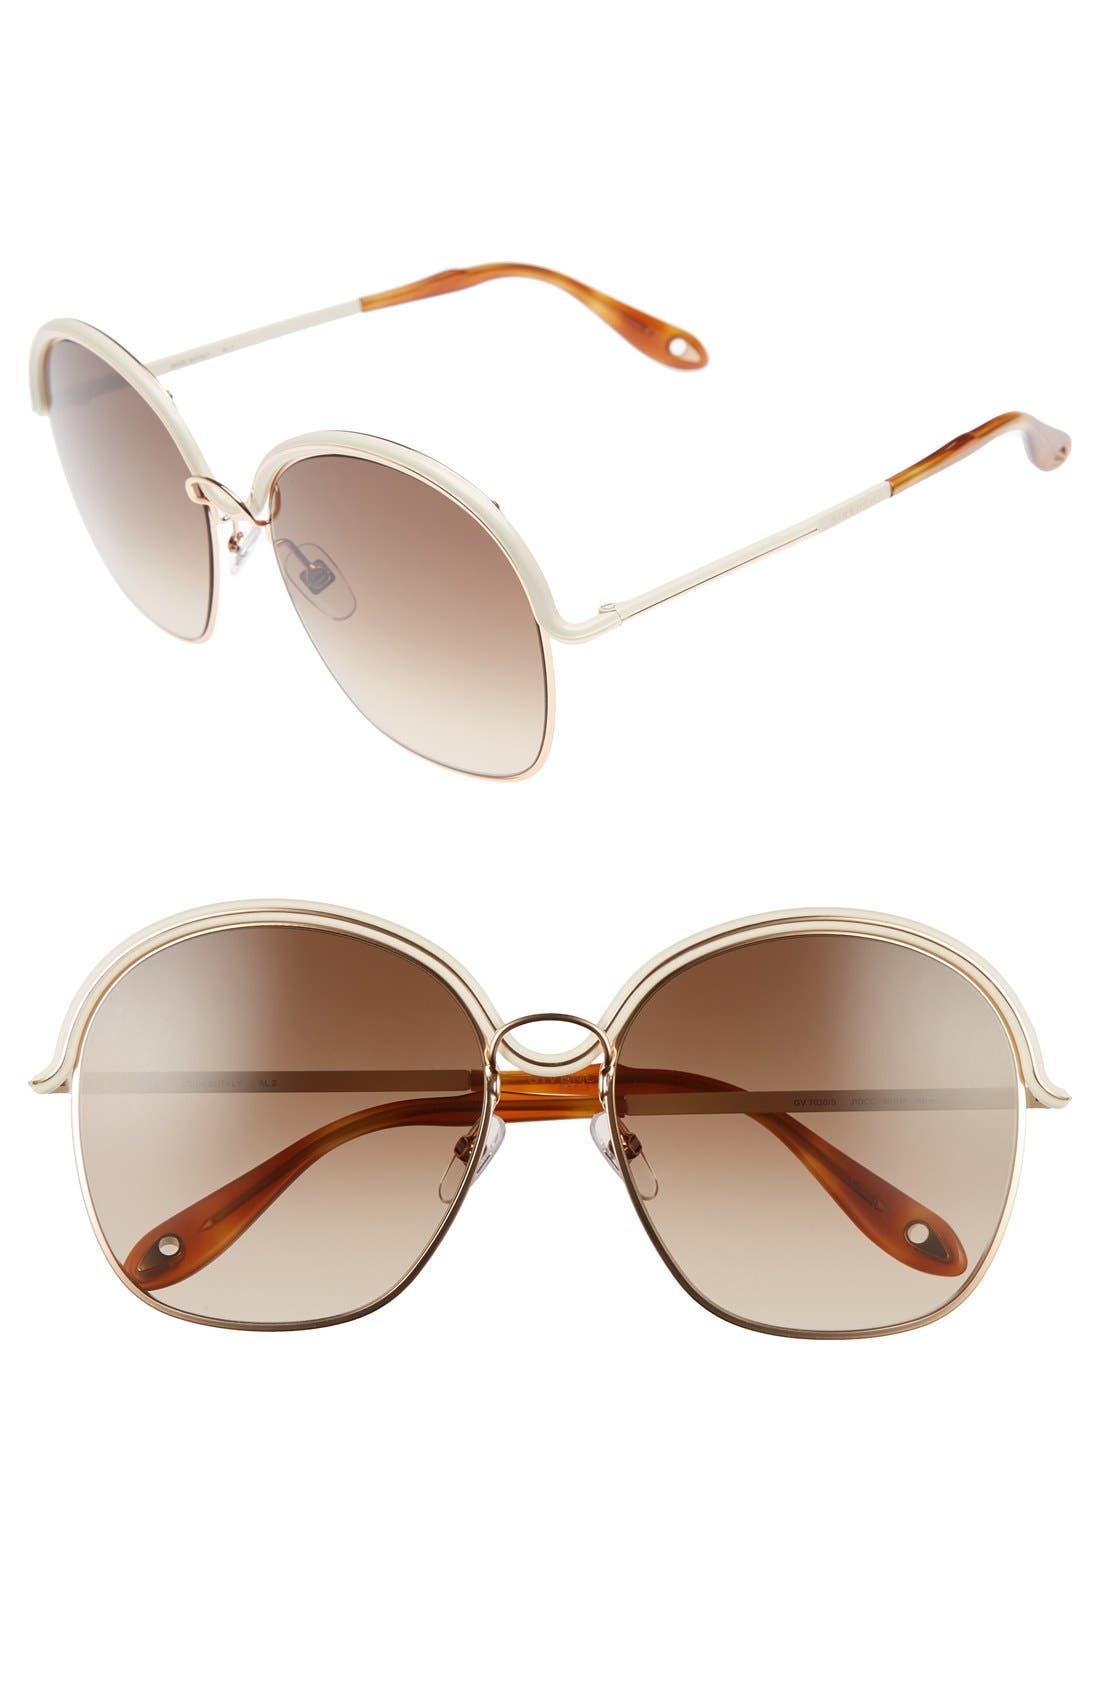 Main Image - Givenchy 7030/S 58mm Oversized Sunglasses